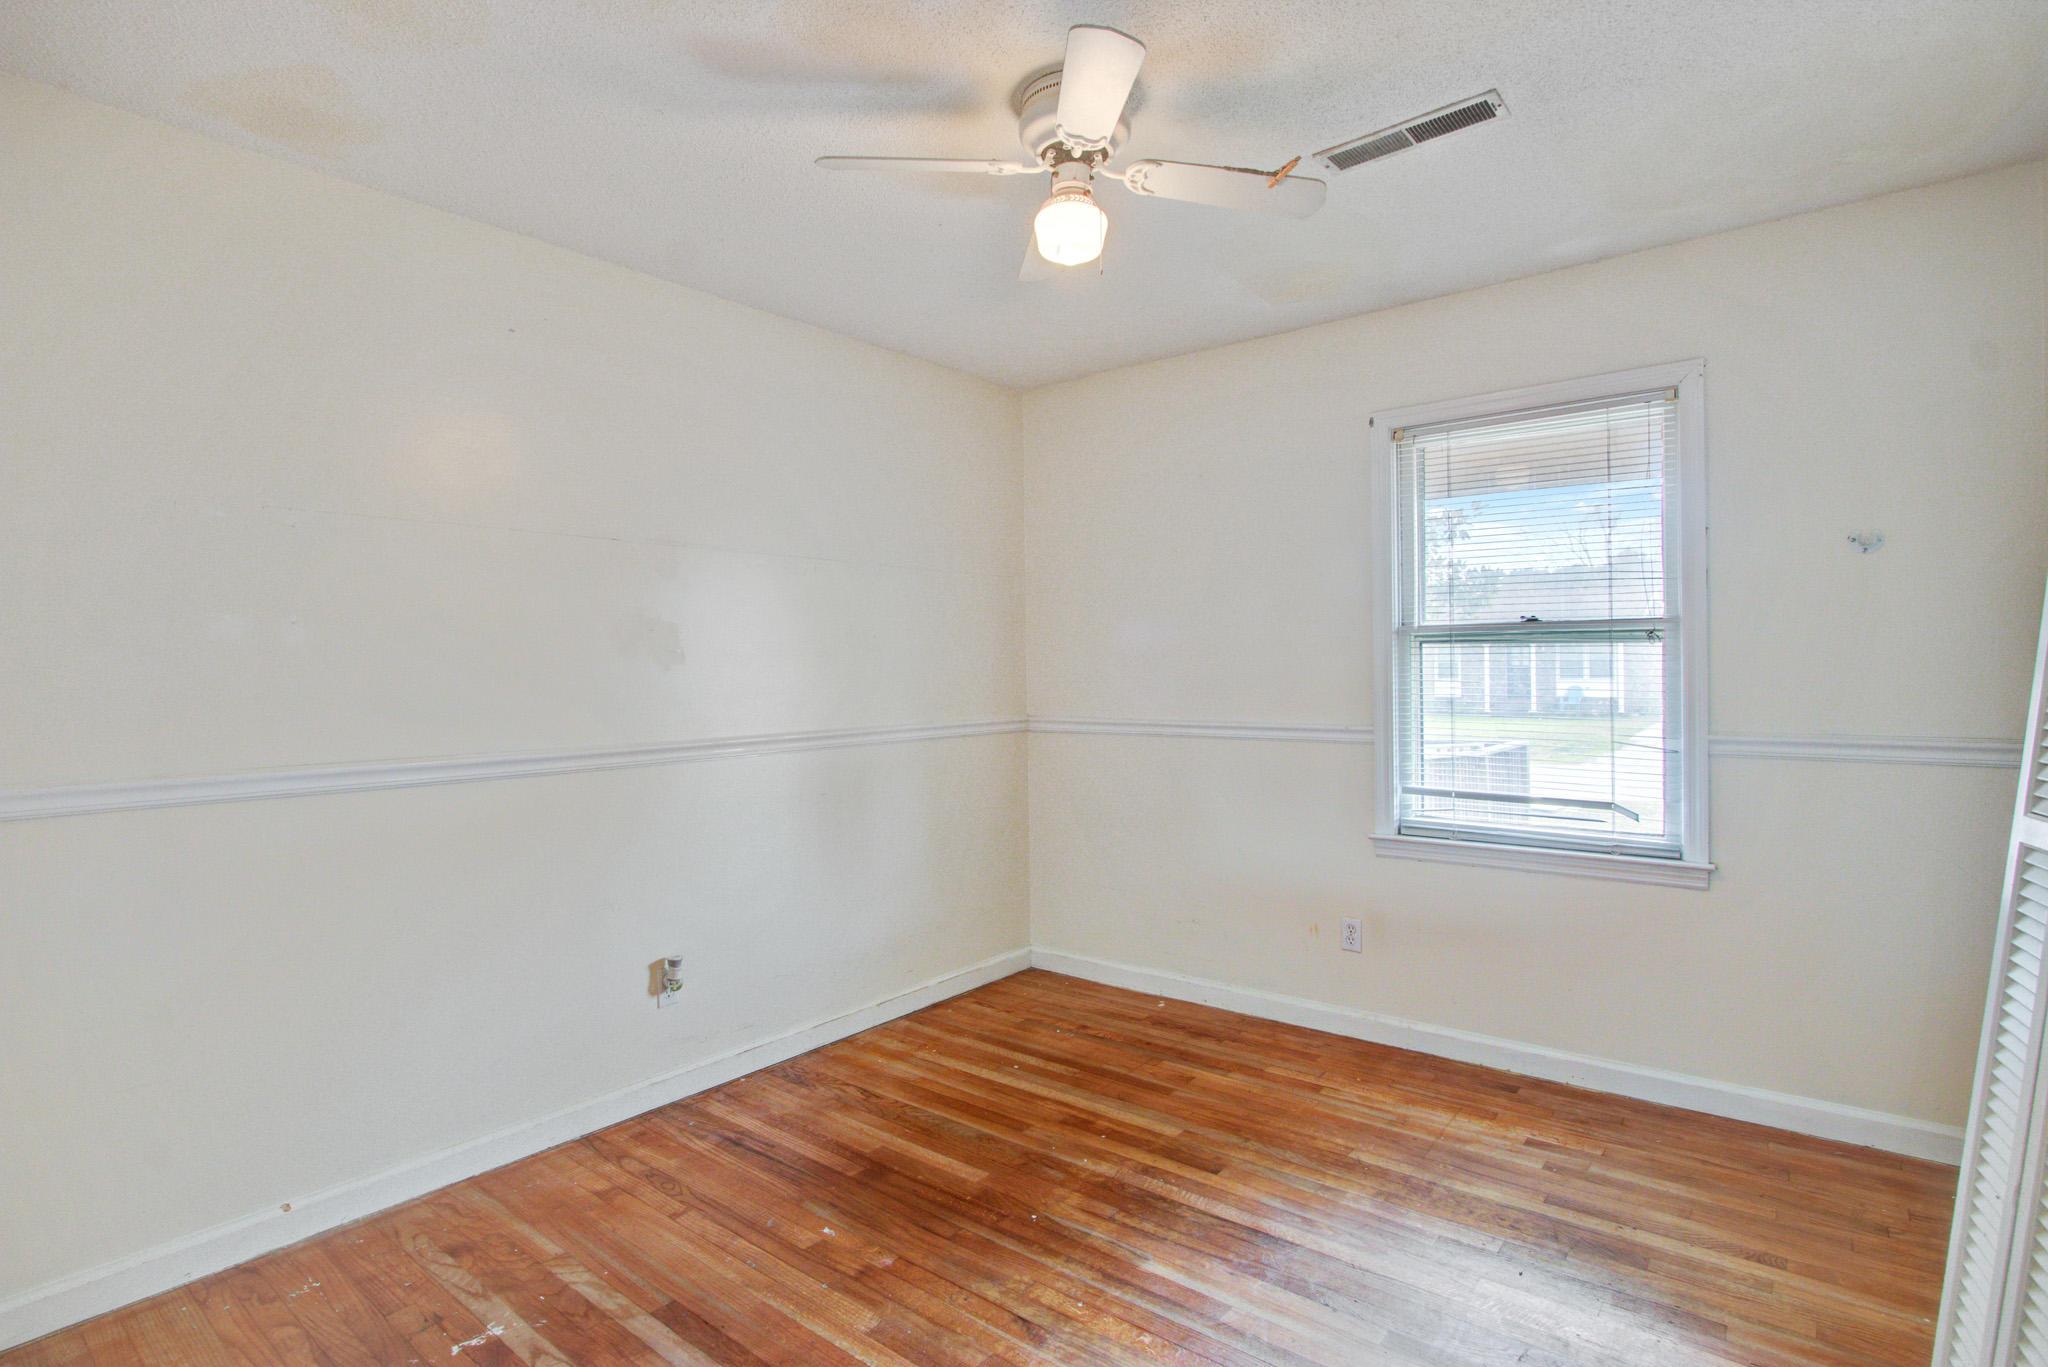 Bushy Park Terrace Homes For Sale - 125 Azalea, Goose Creek, SC - 9